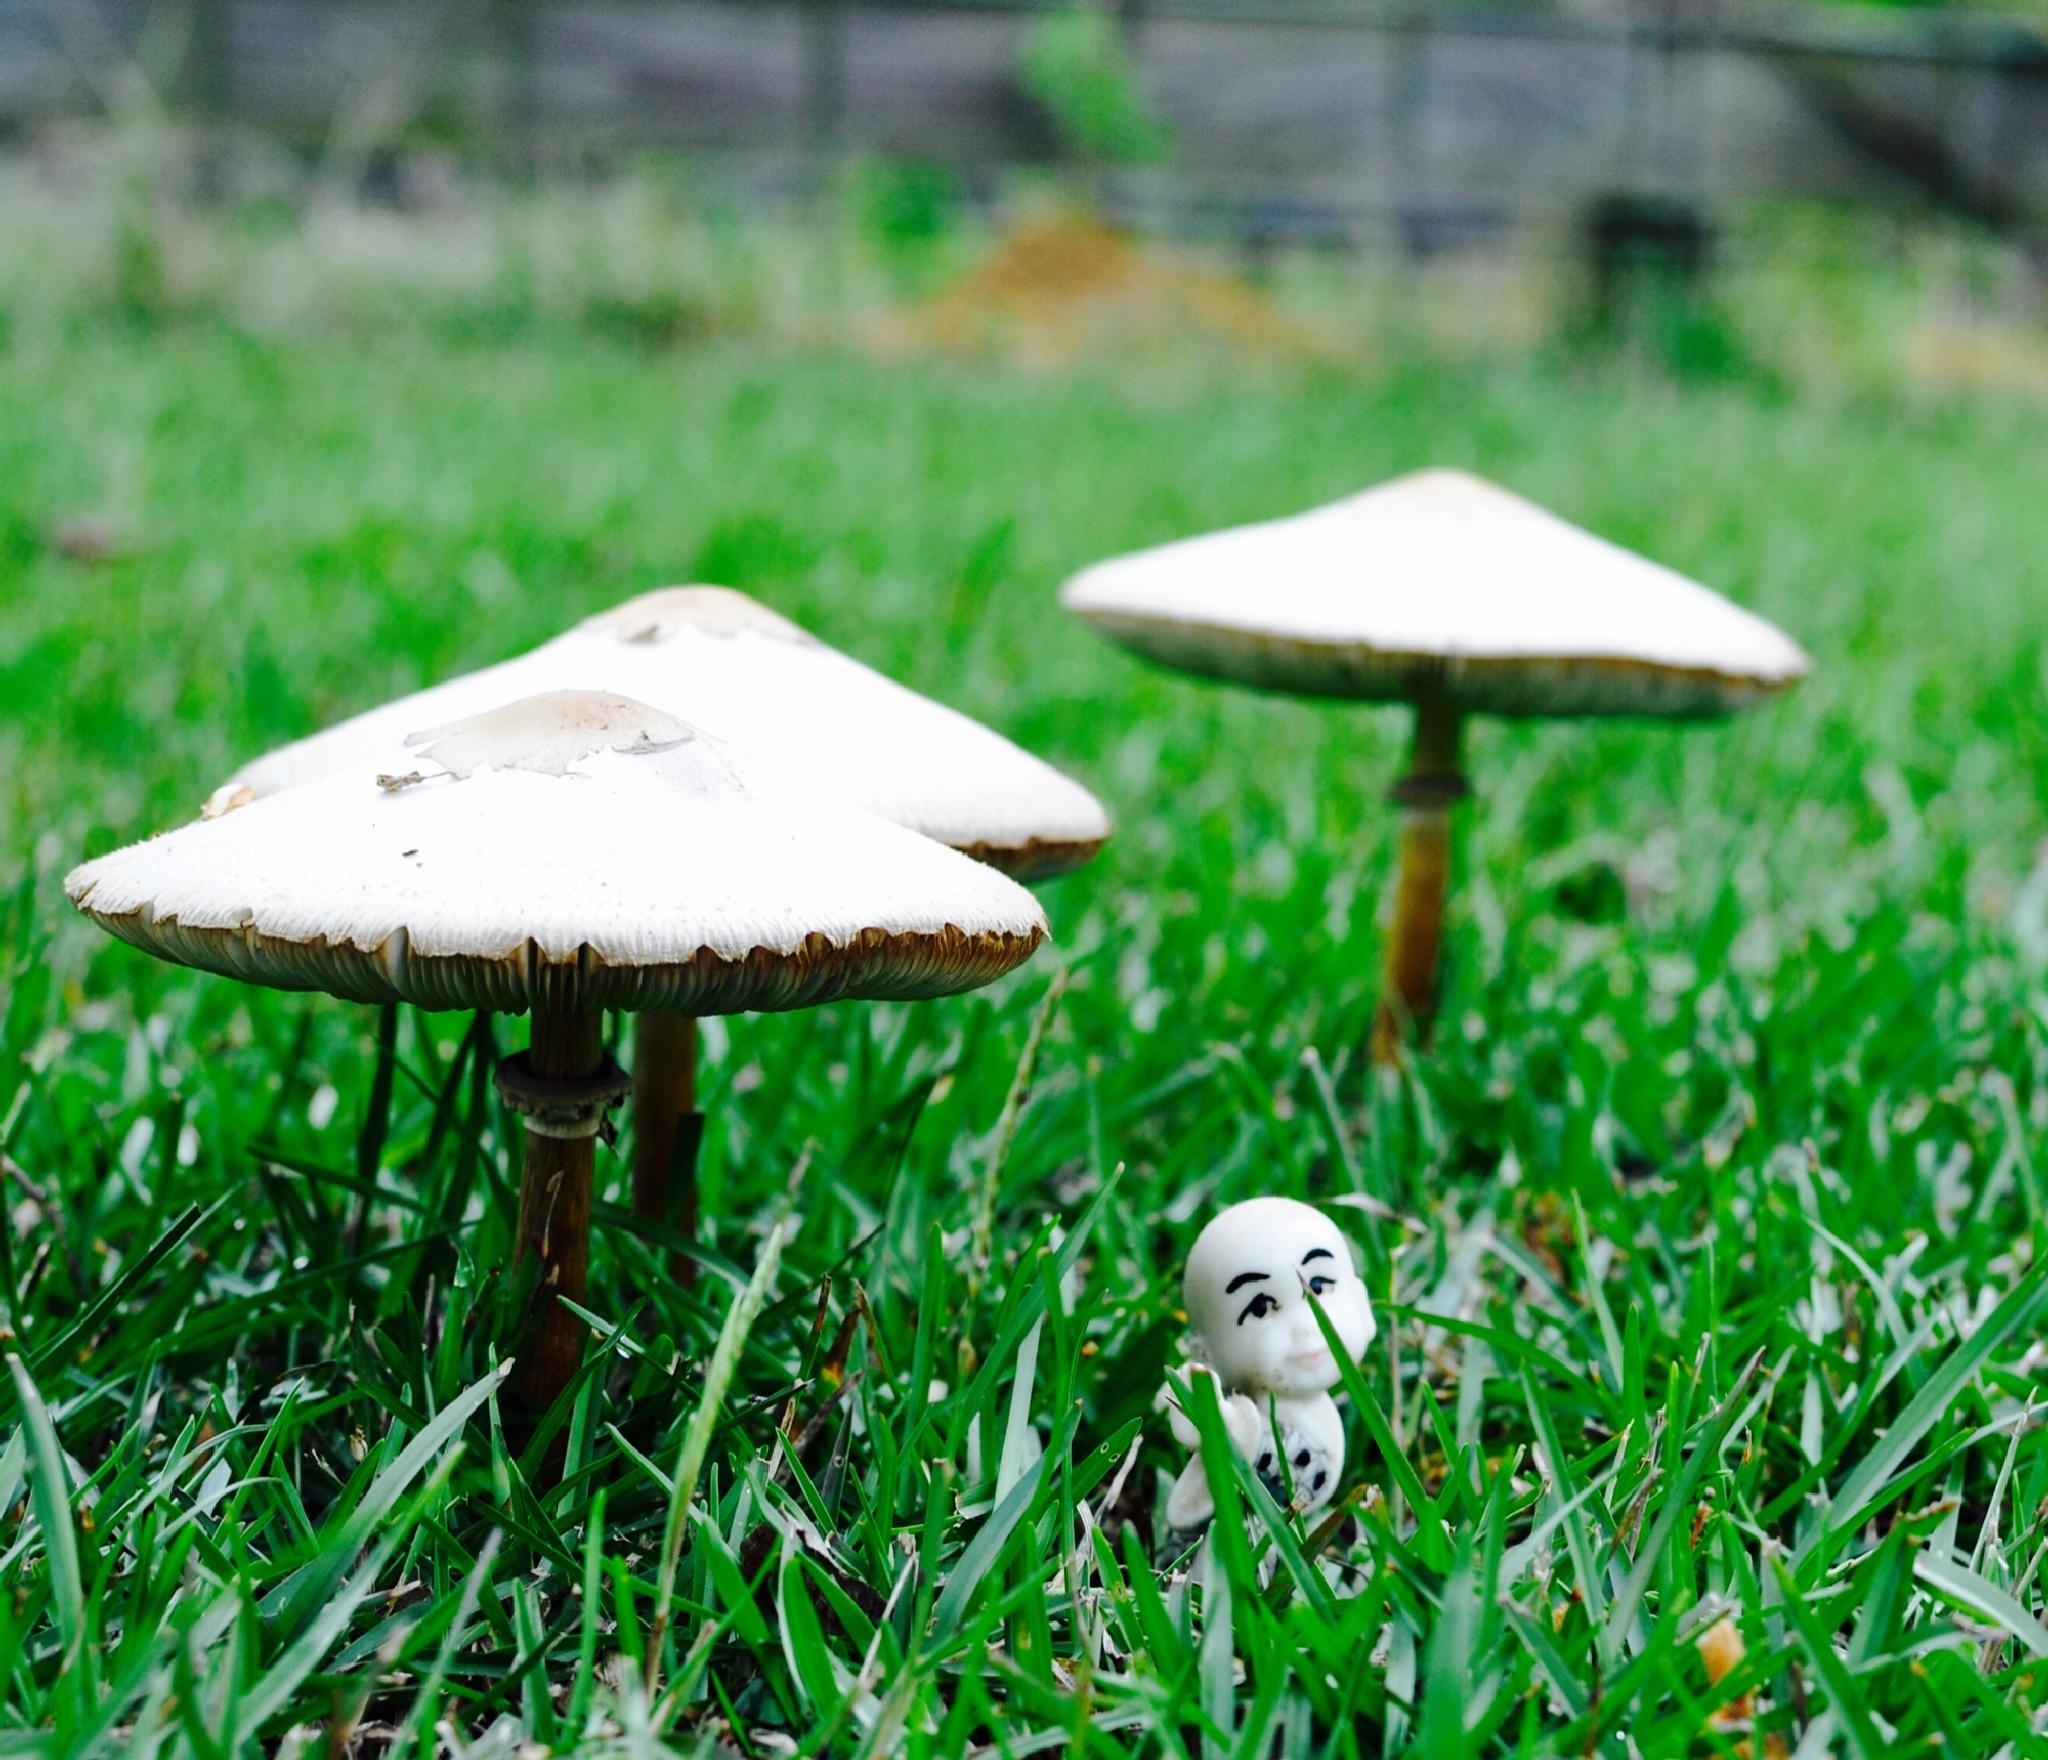 Land of the mushrooms by Kim Logan Brown